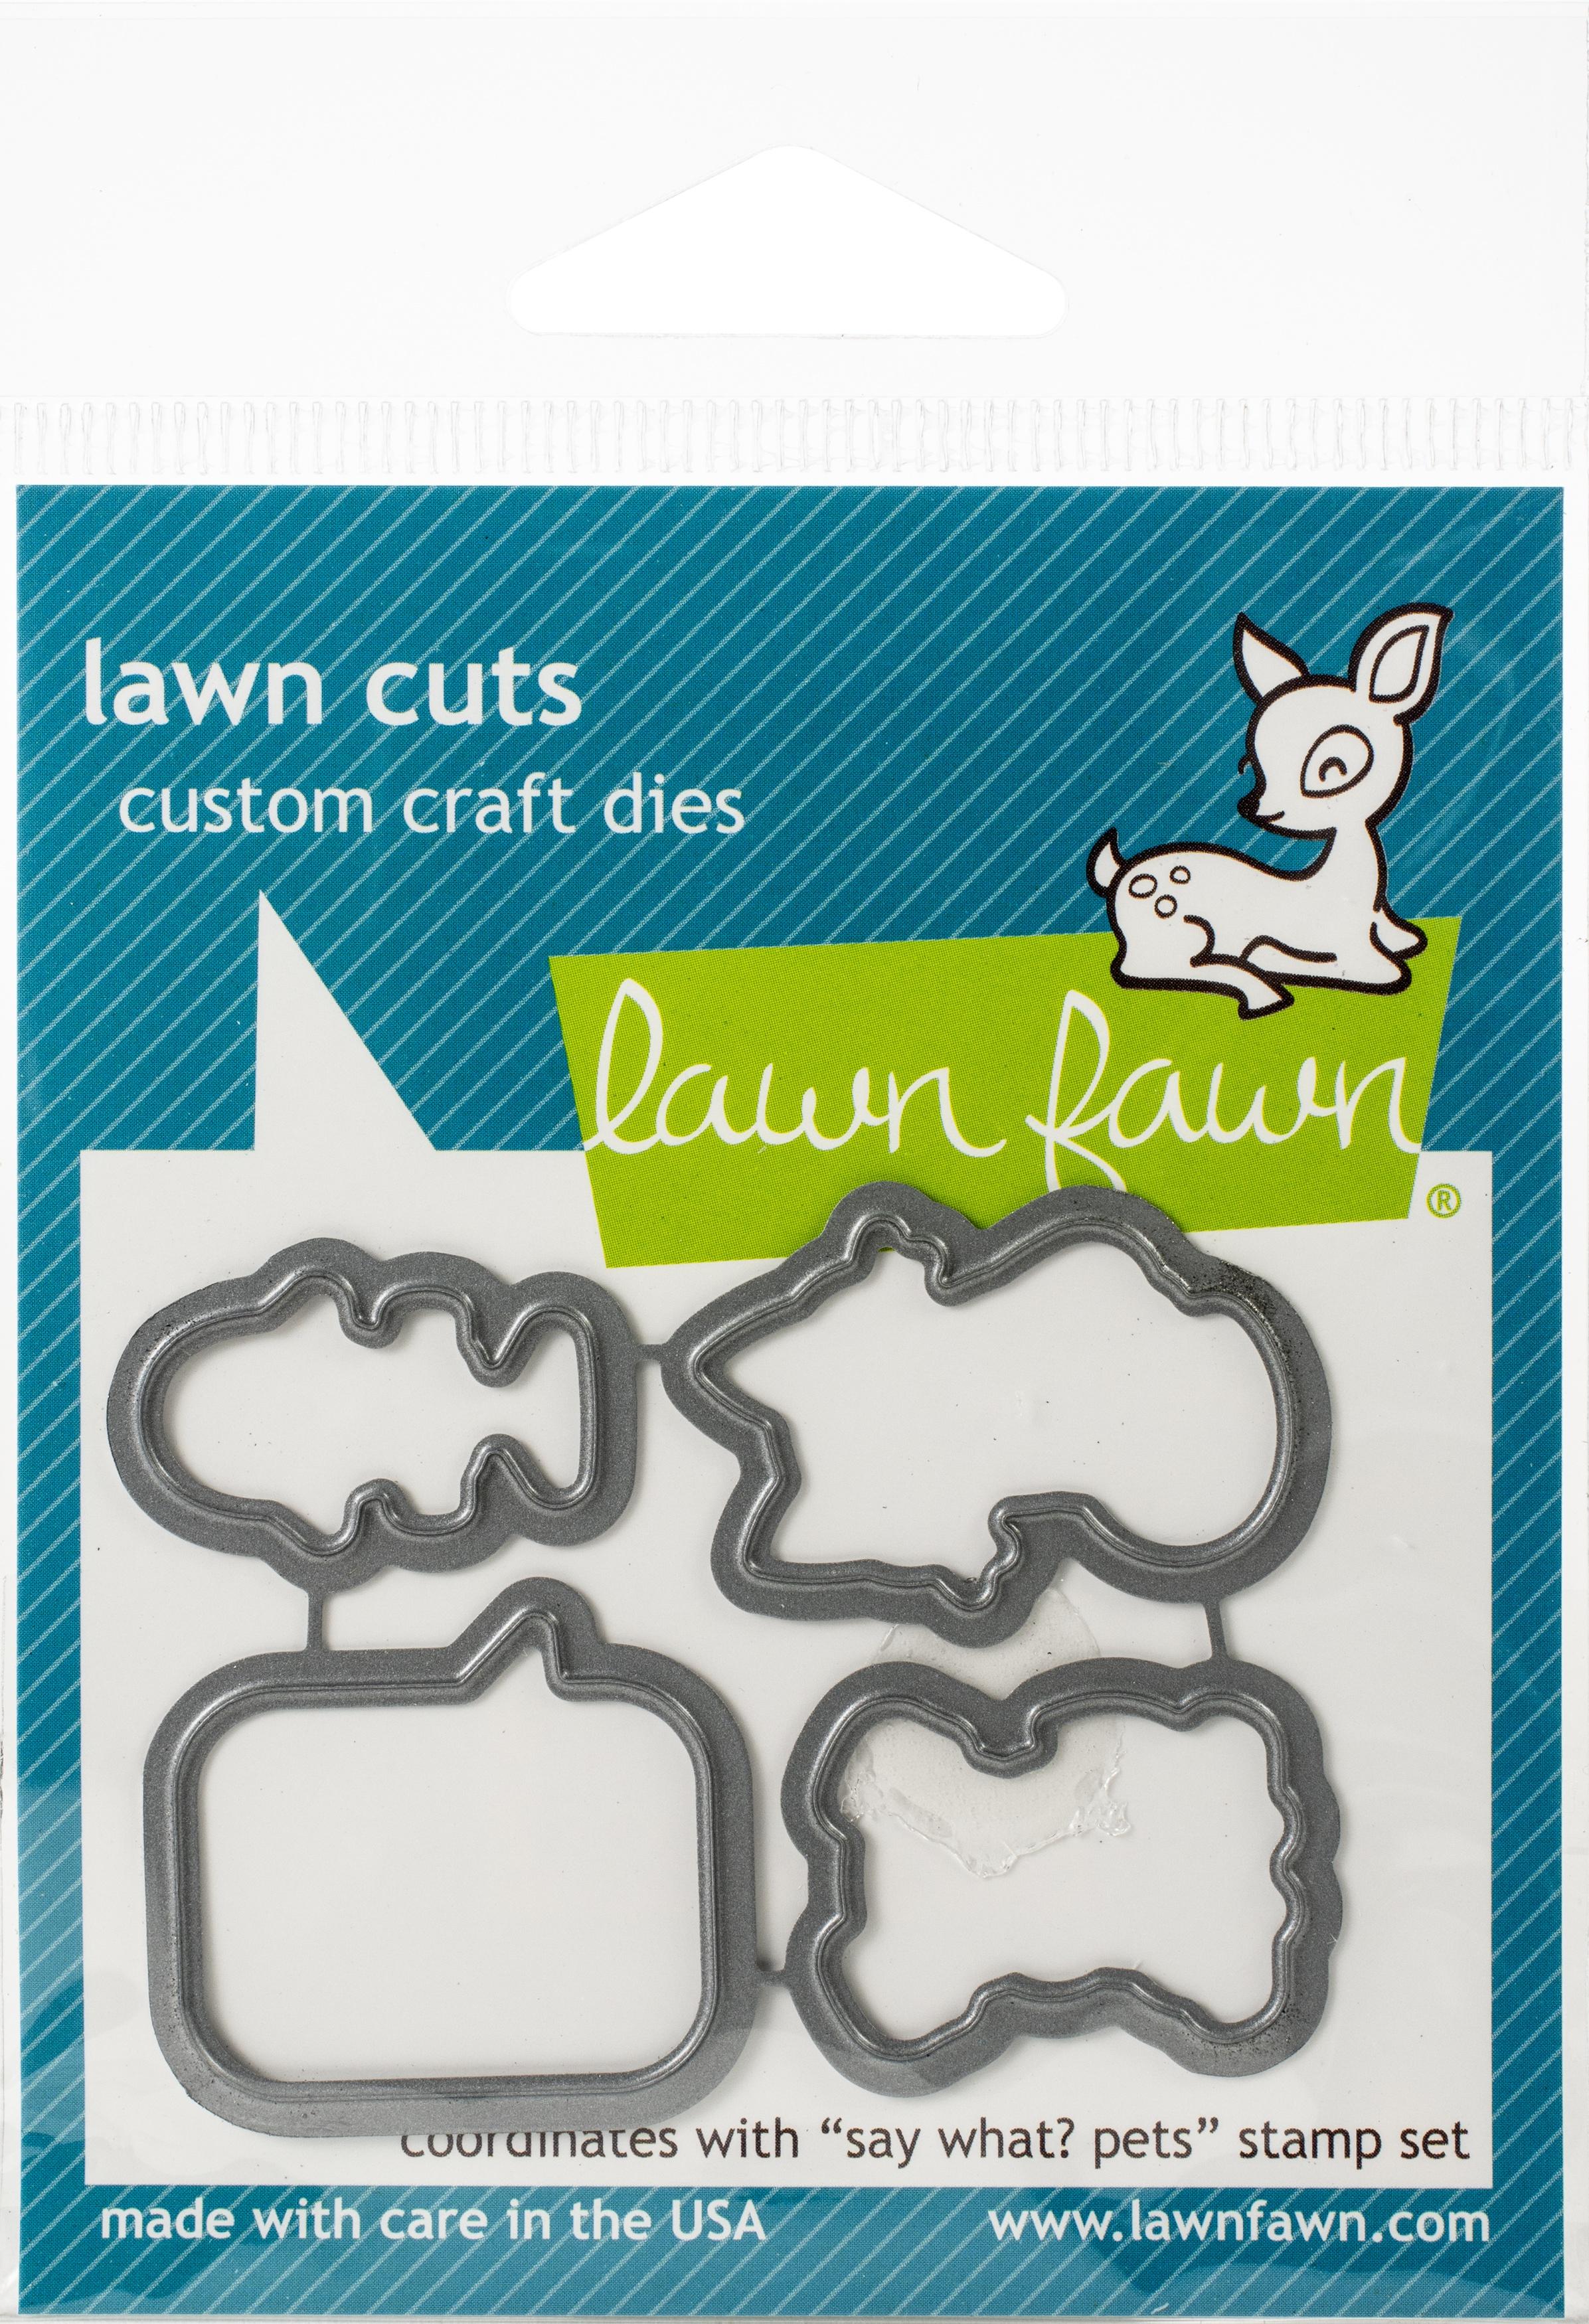 Lawn Cuts Custom Craft Die-Say What? Pets